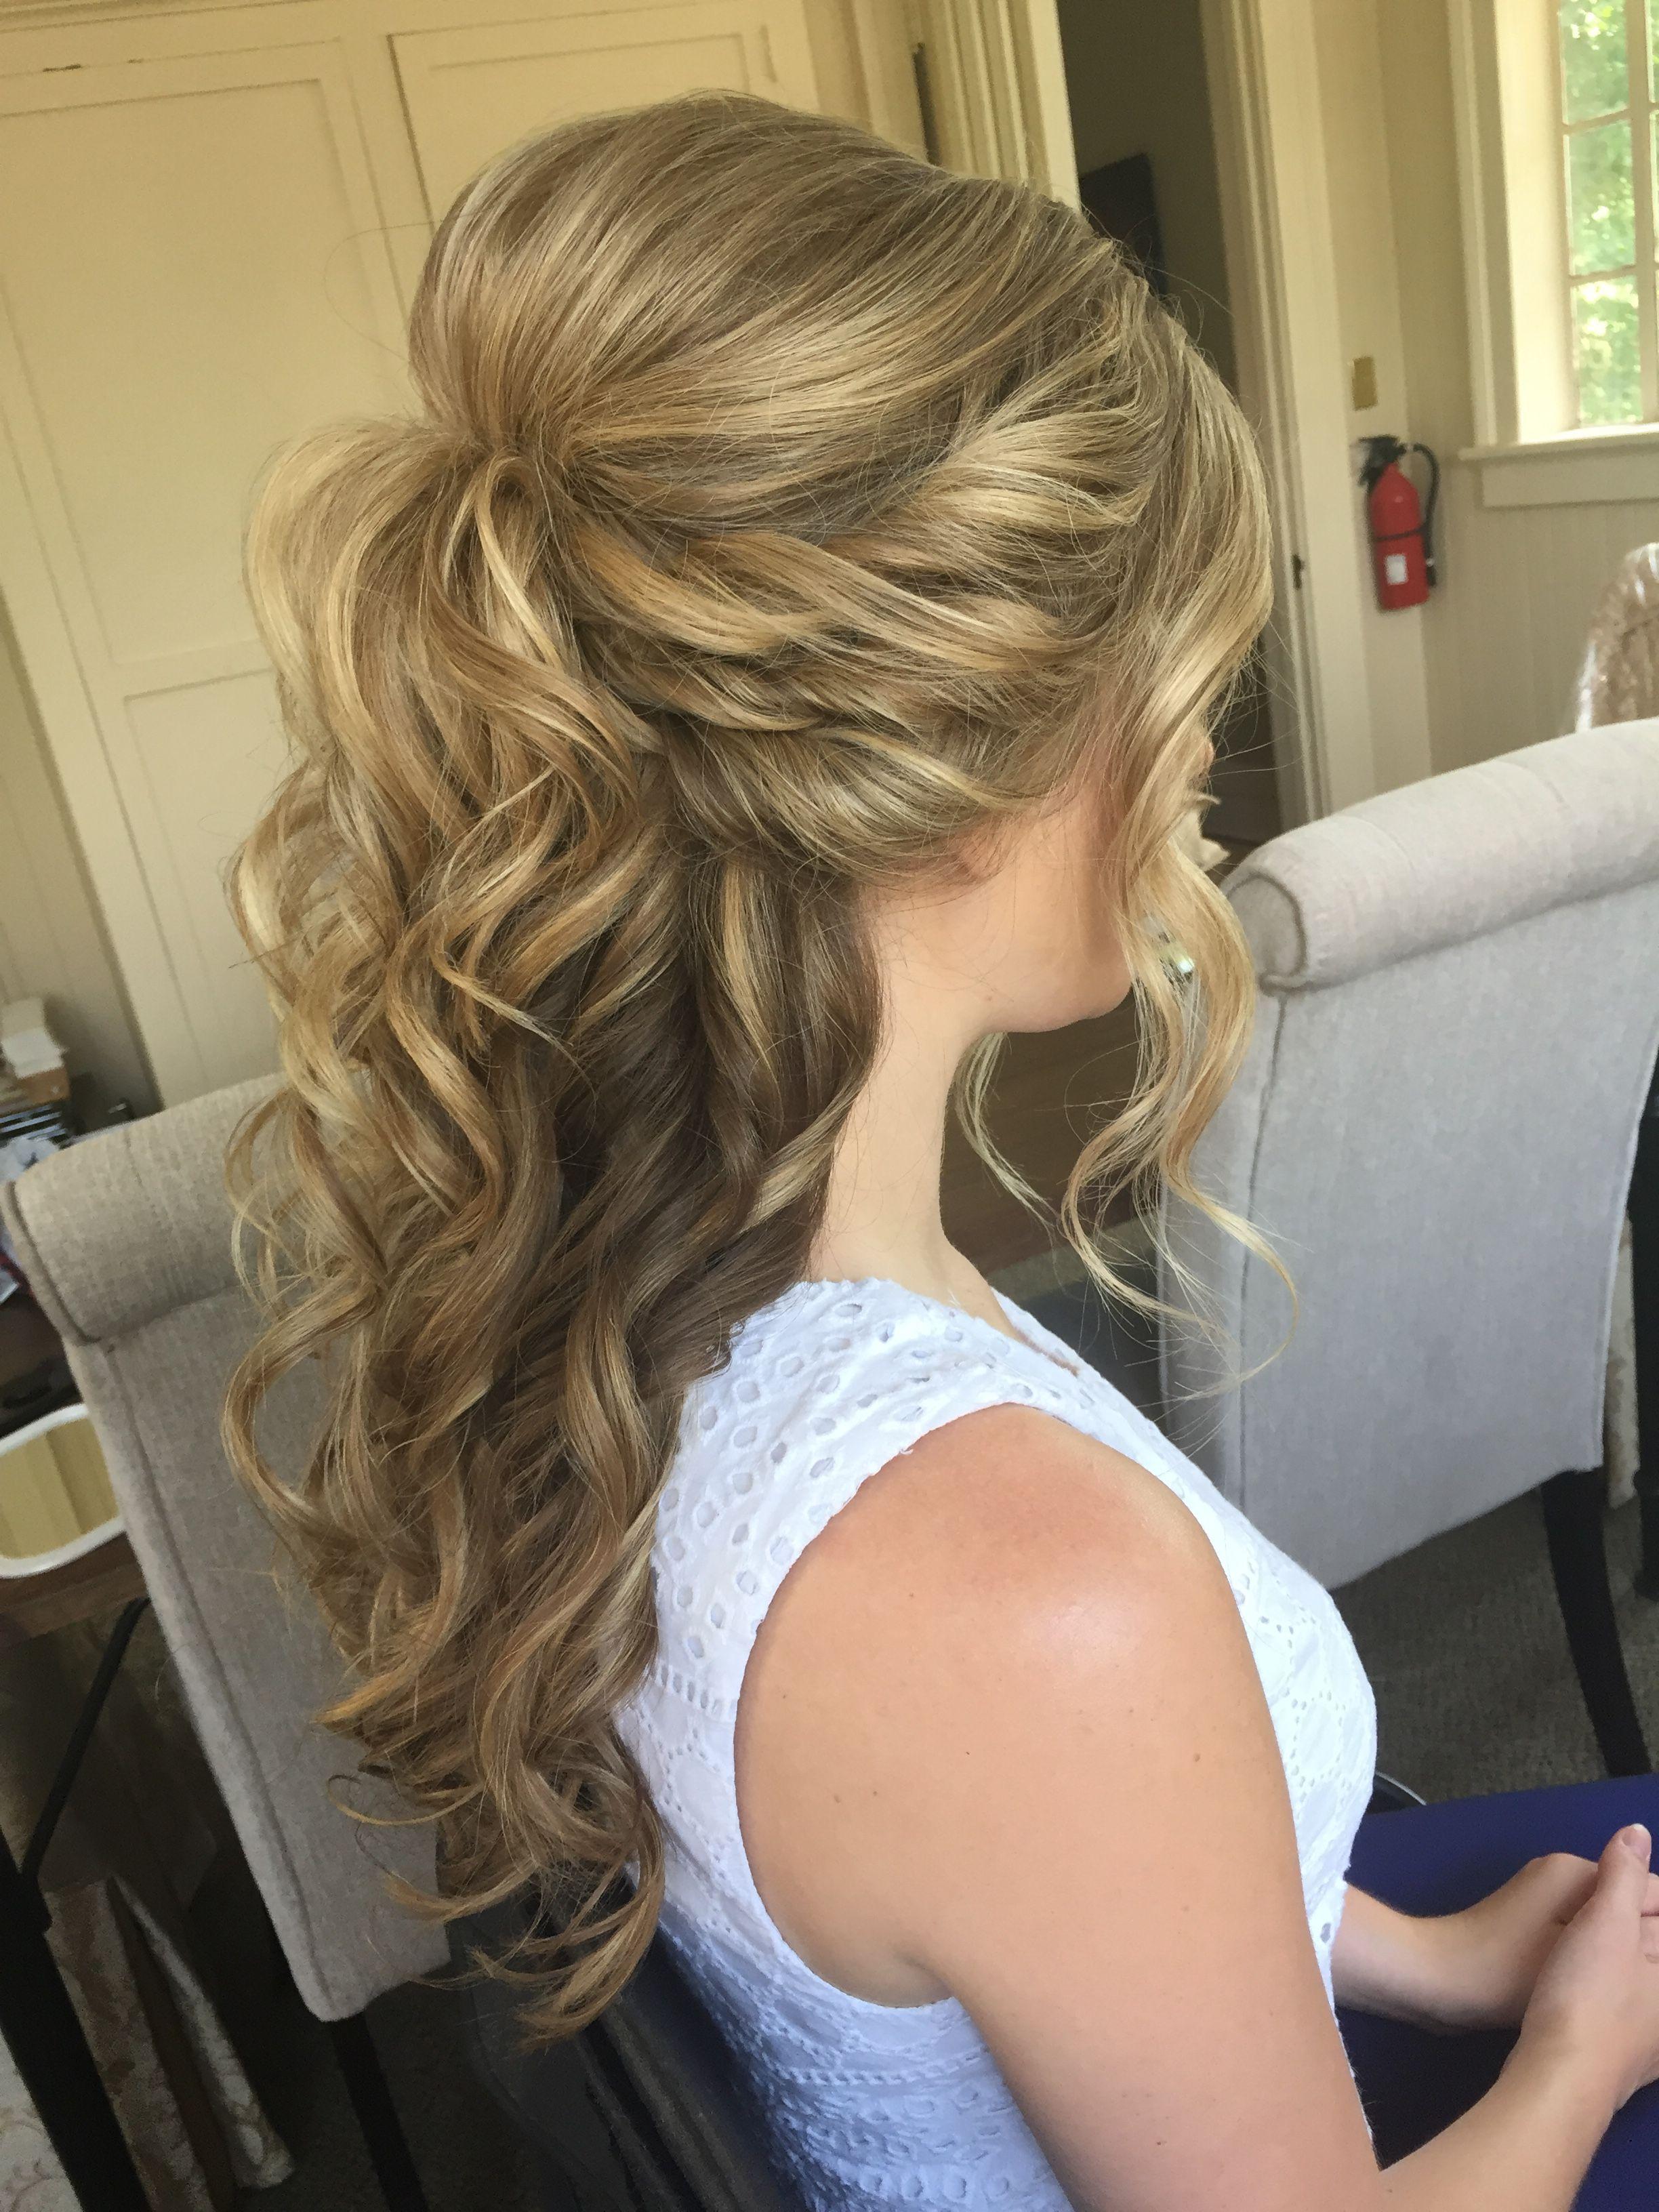 Half-Up Half-Down Wedding Hair http://eroticwadewisdom ...